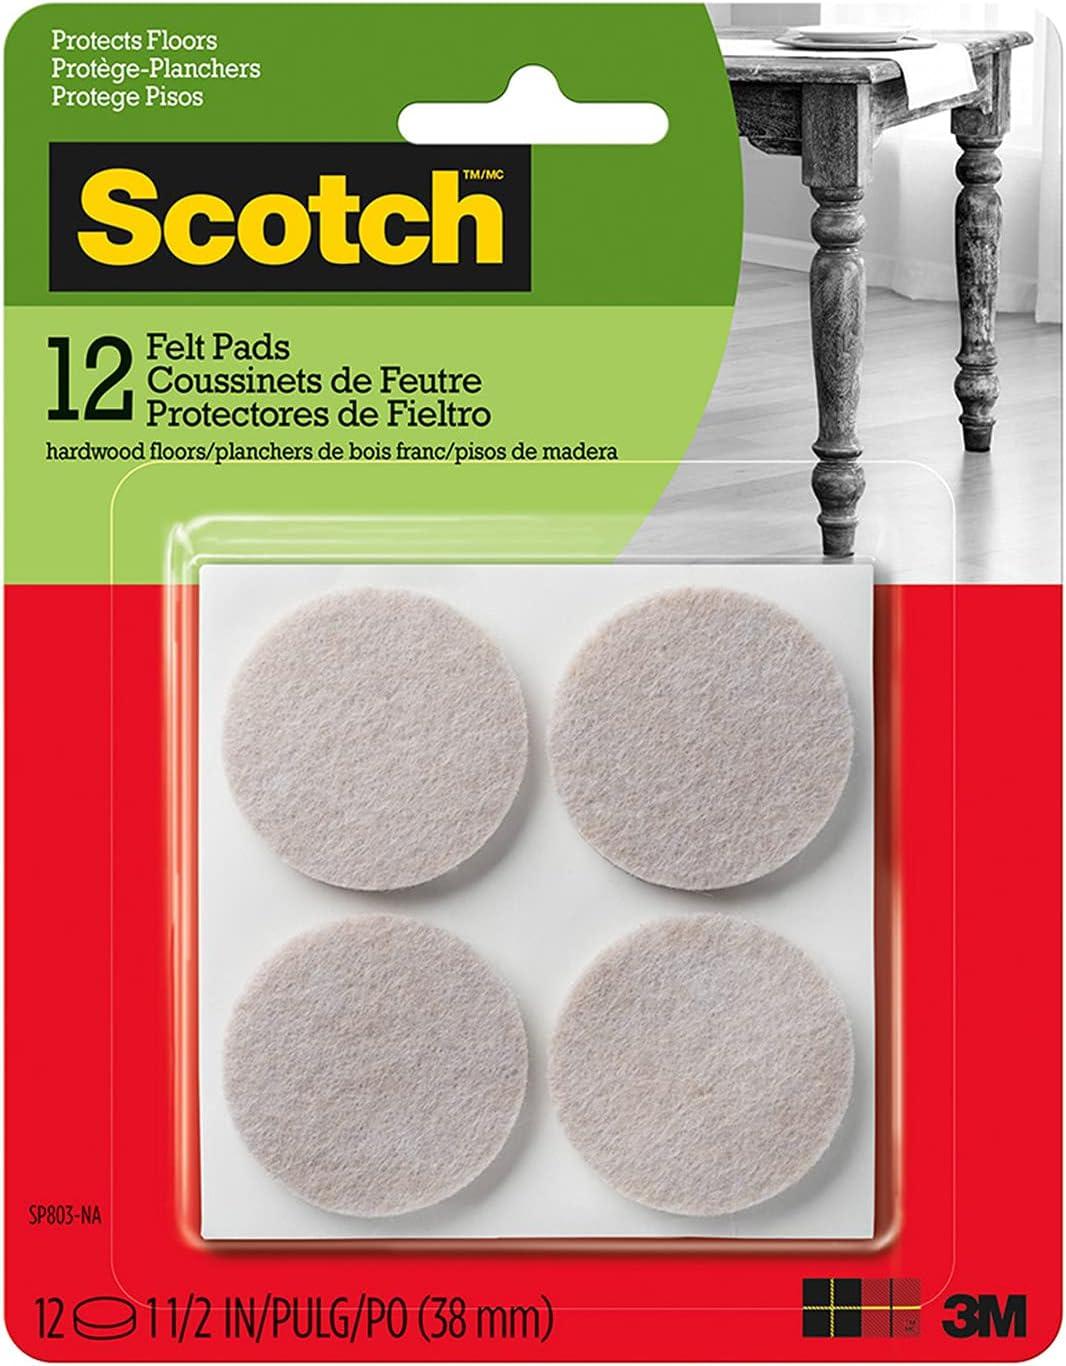 Scotch Felt Pads Purchase Furniture Fl Protecting for Hardwood Fashion